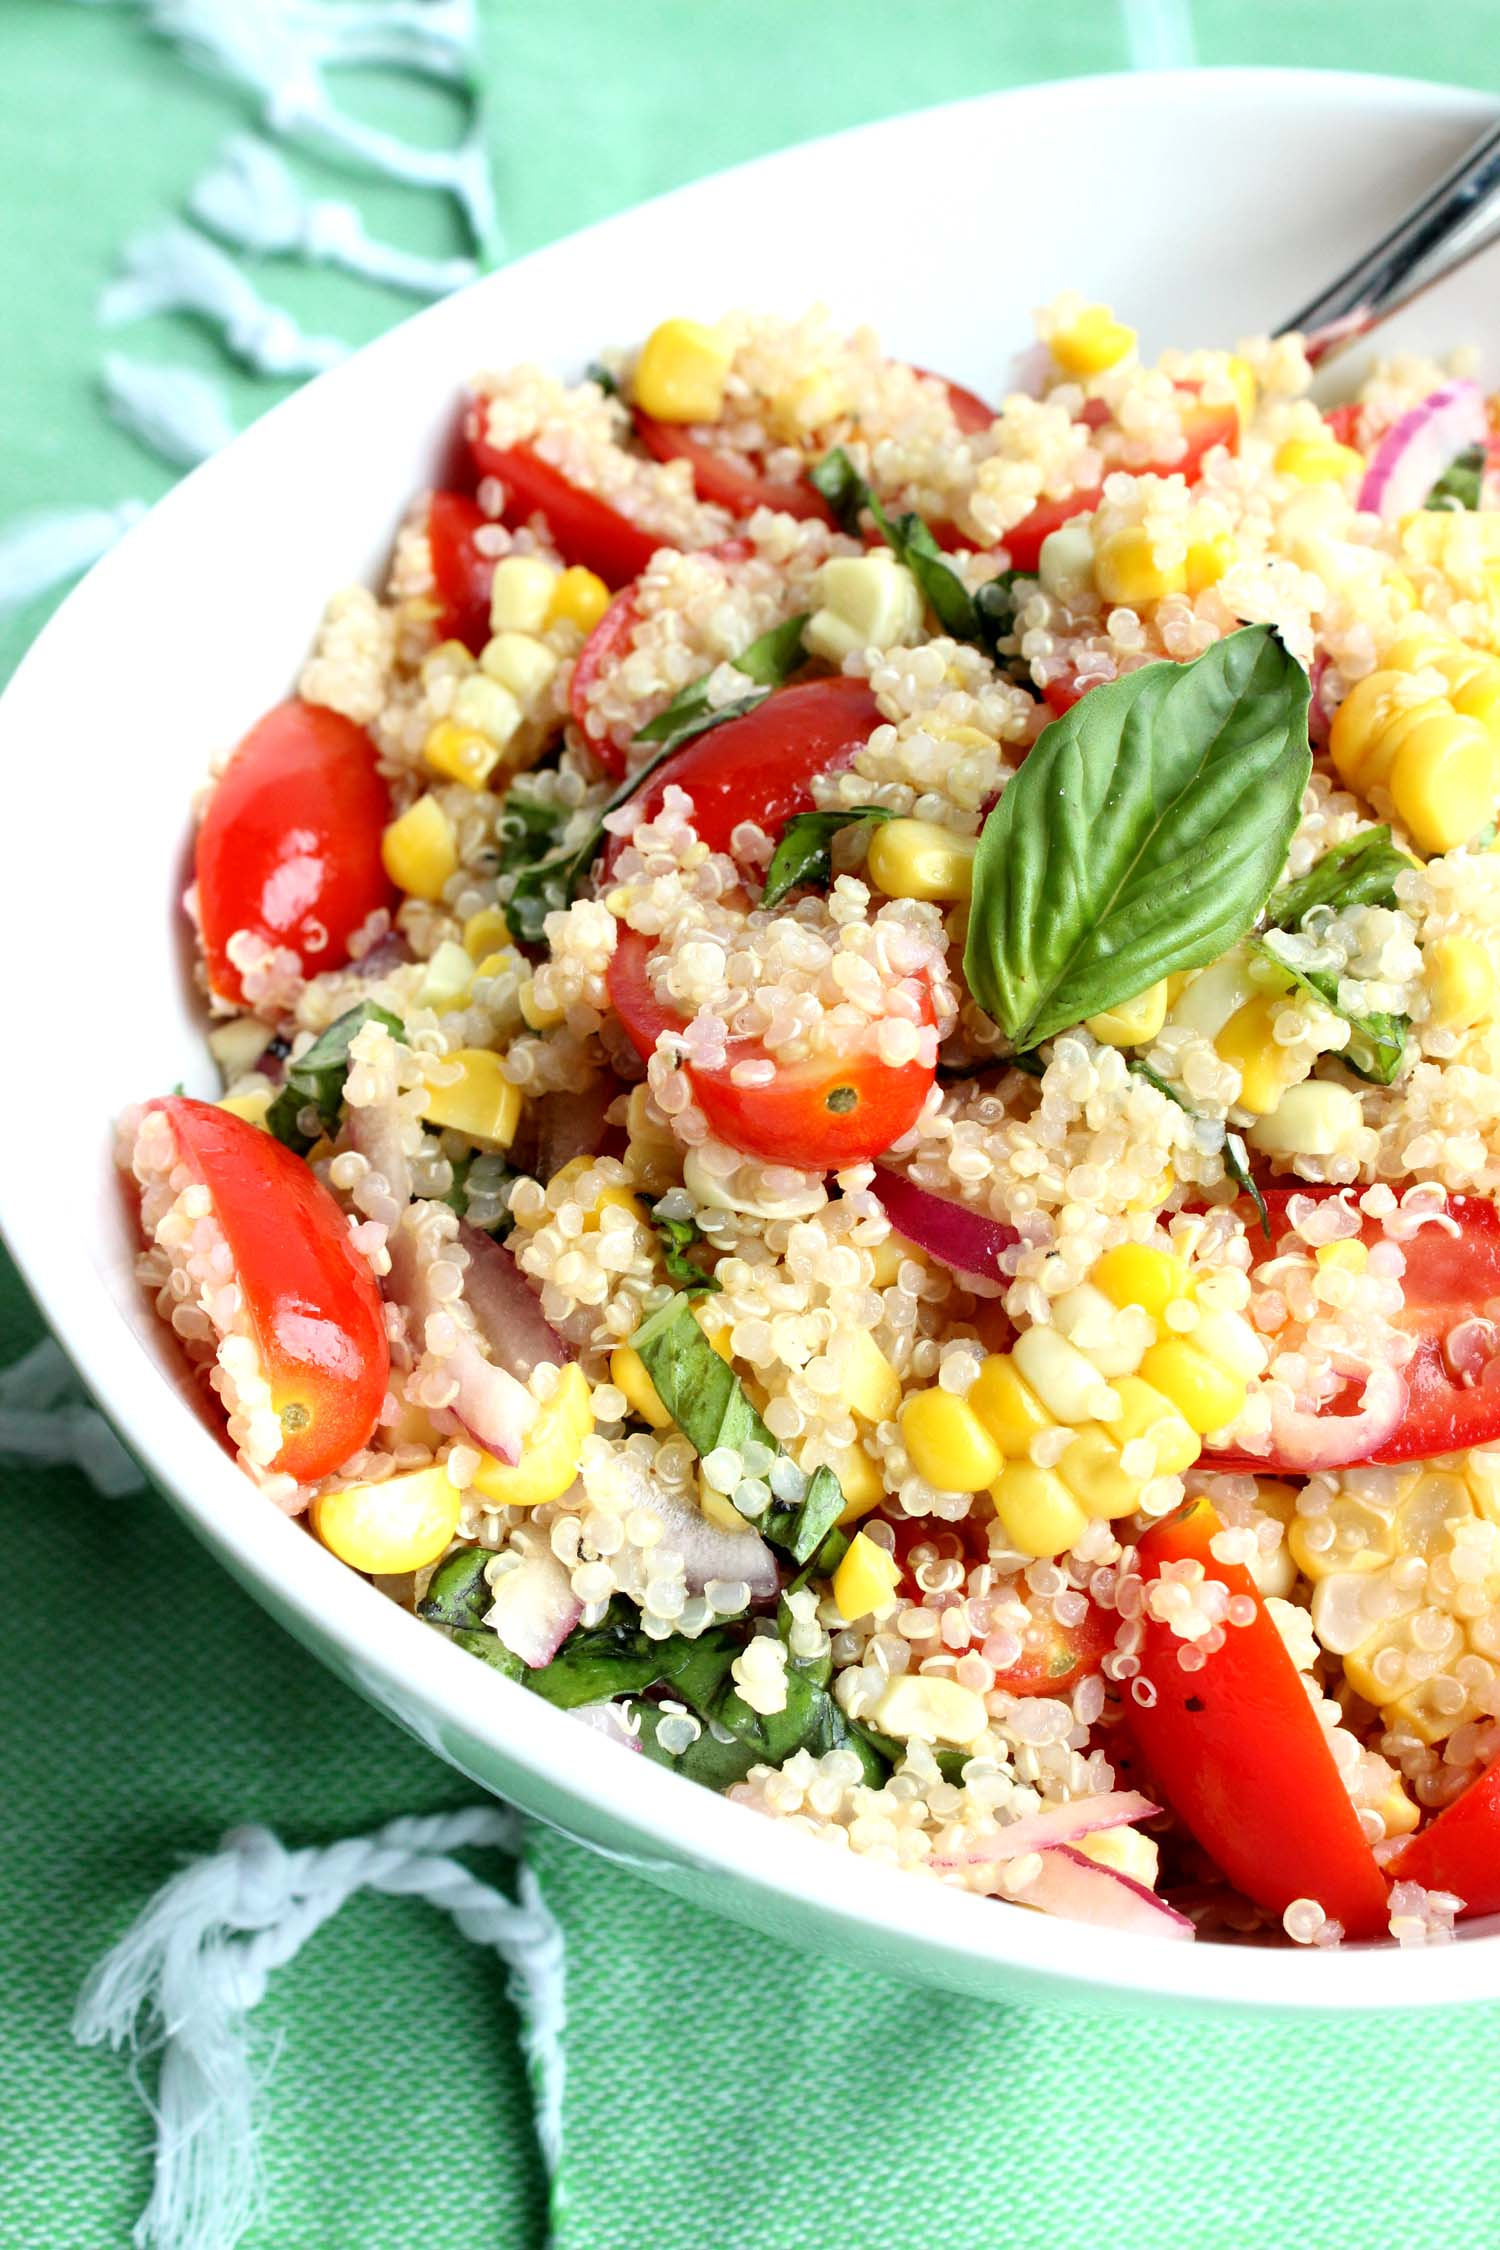 Basil, Corn & Quinoa Salad    Image:  Laura Messersmith